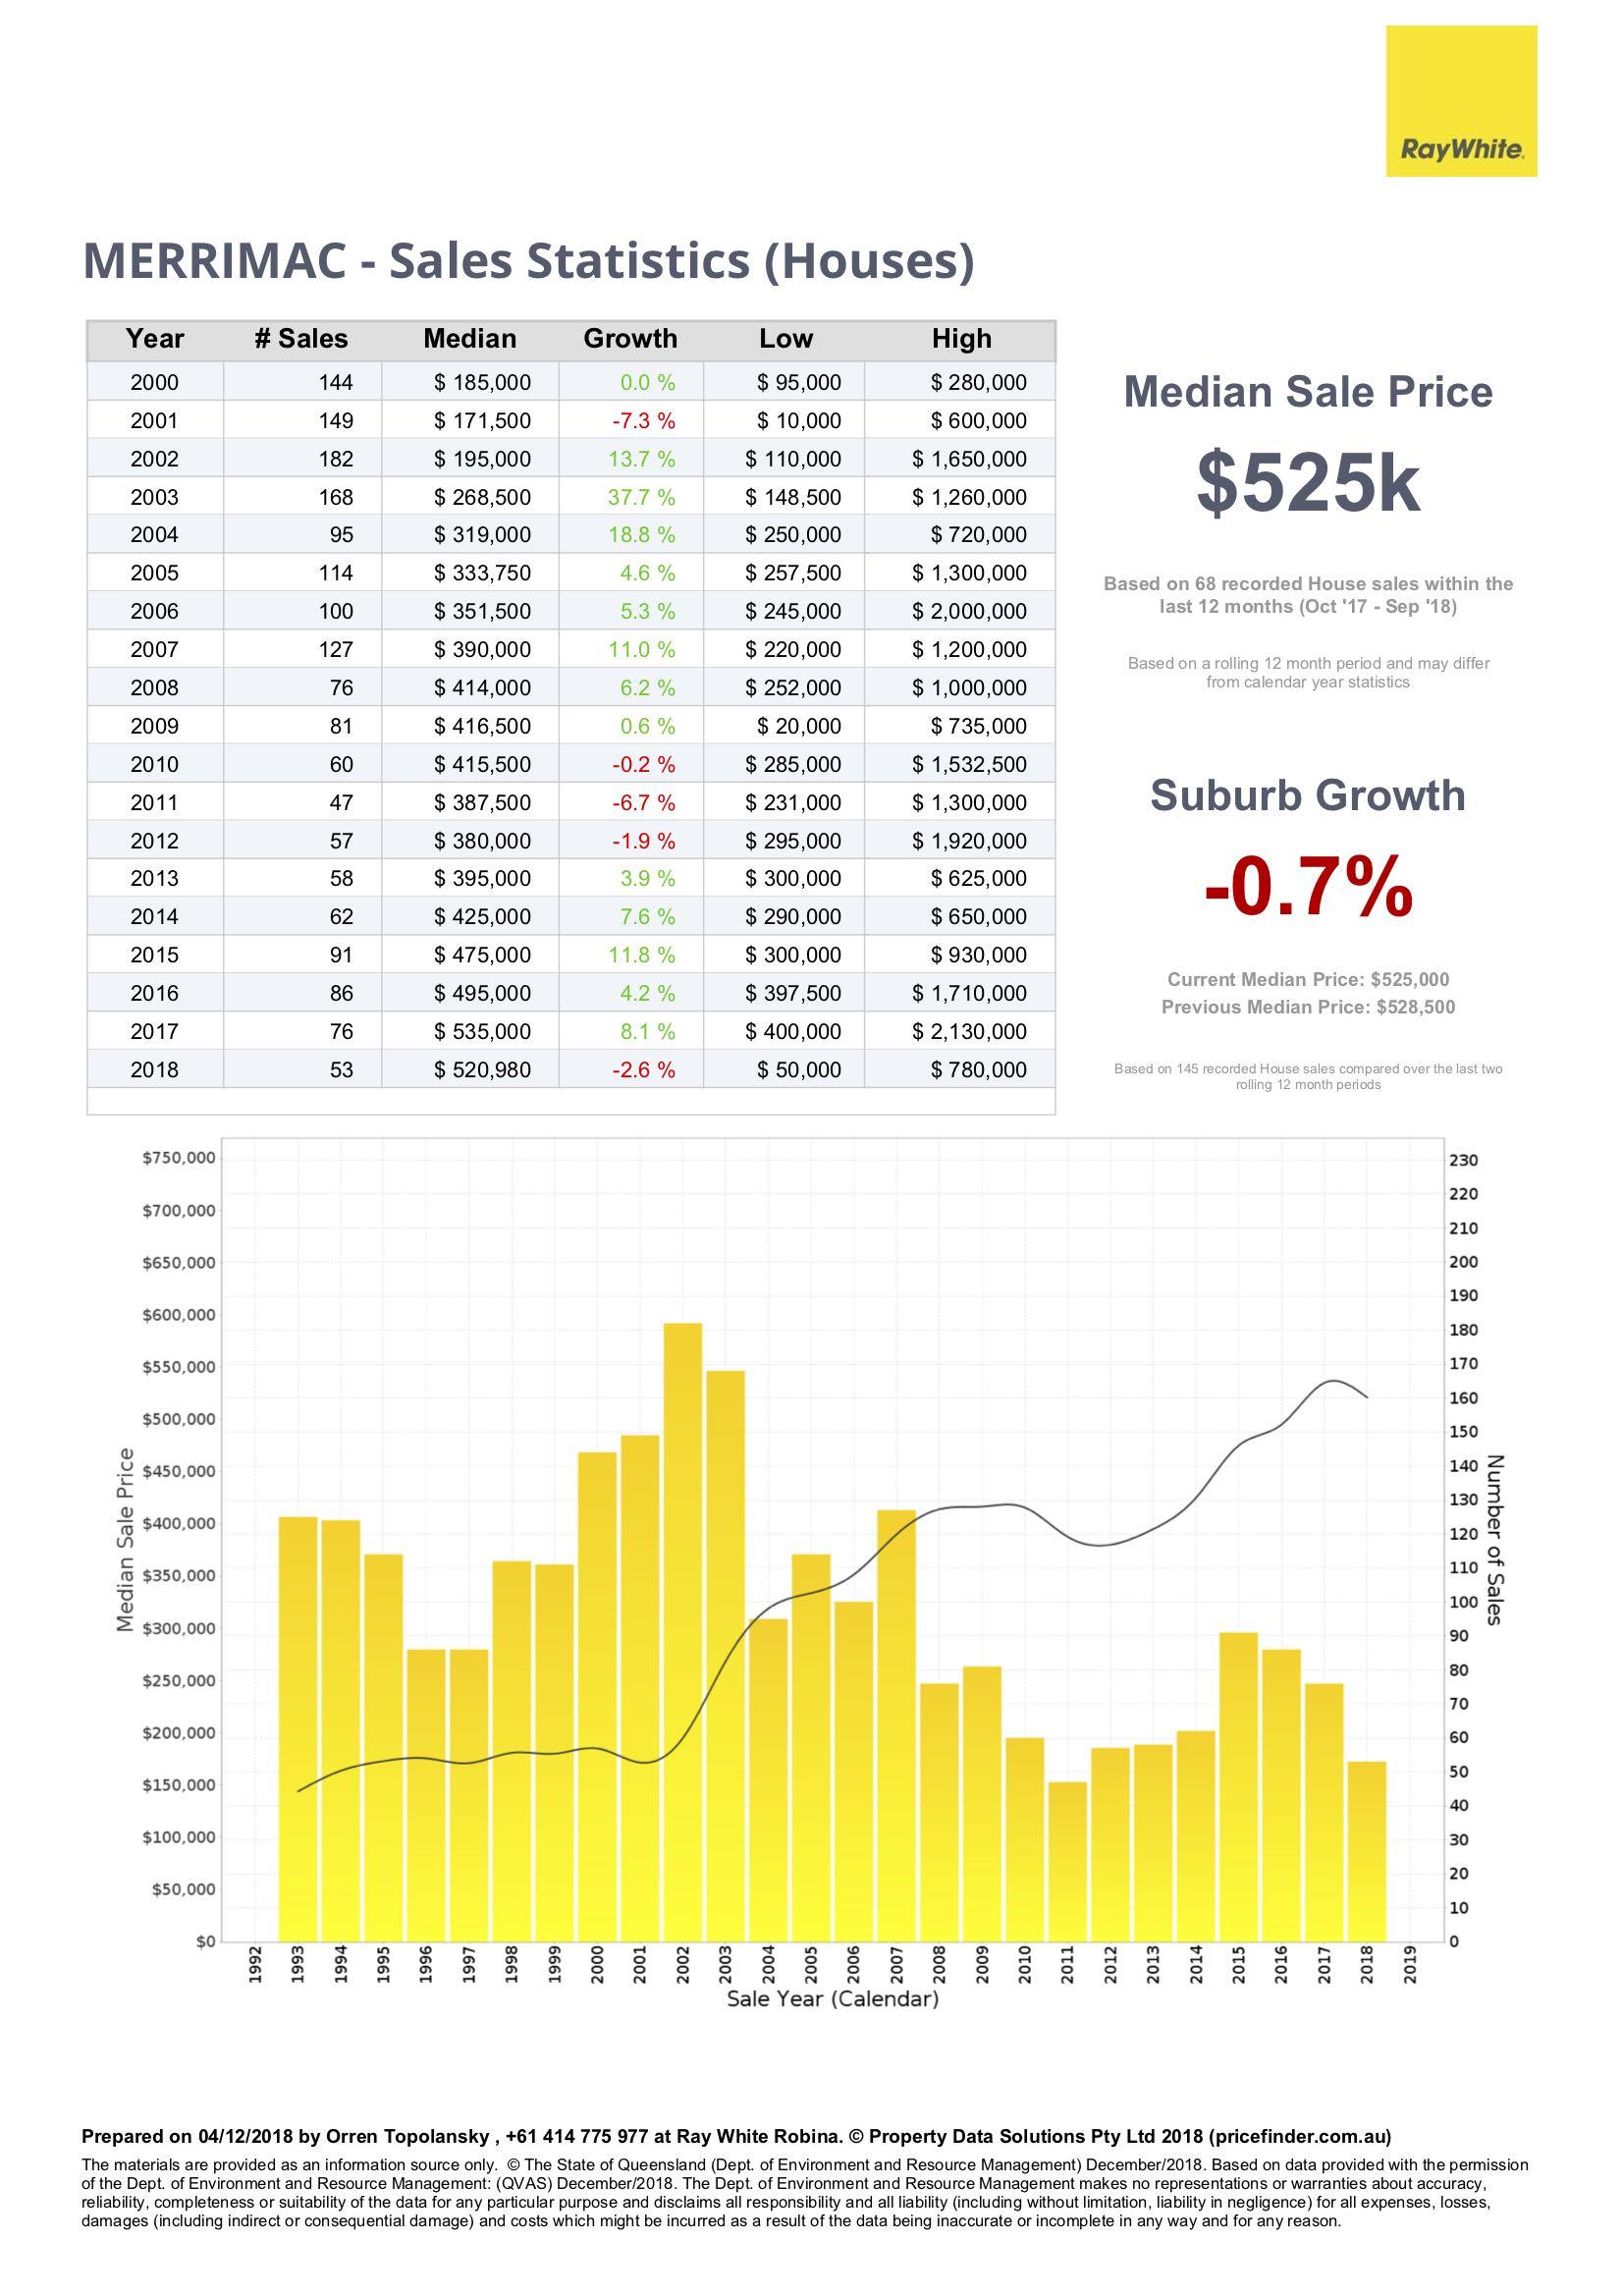 Sales statistics for houses in Merrimac, Gold Coast